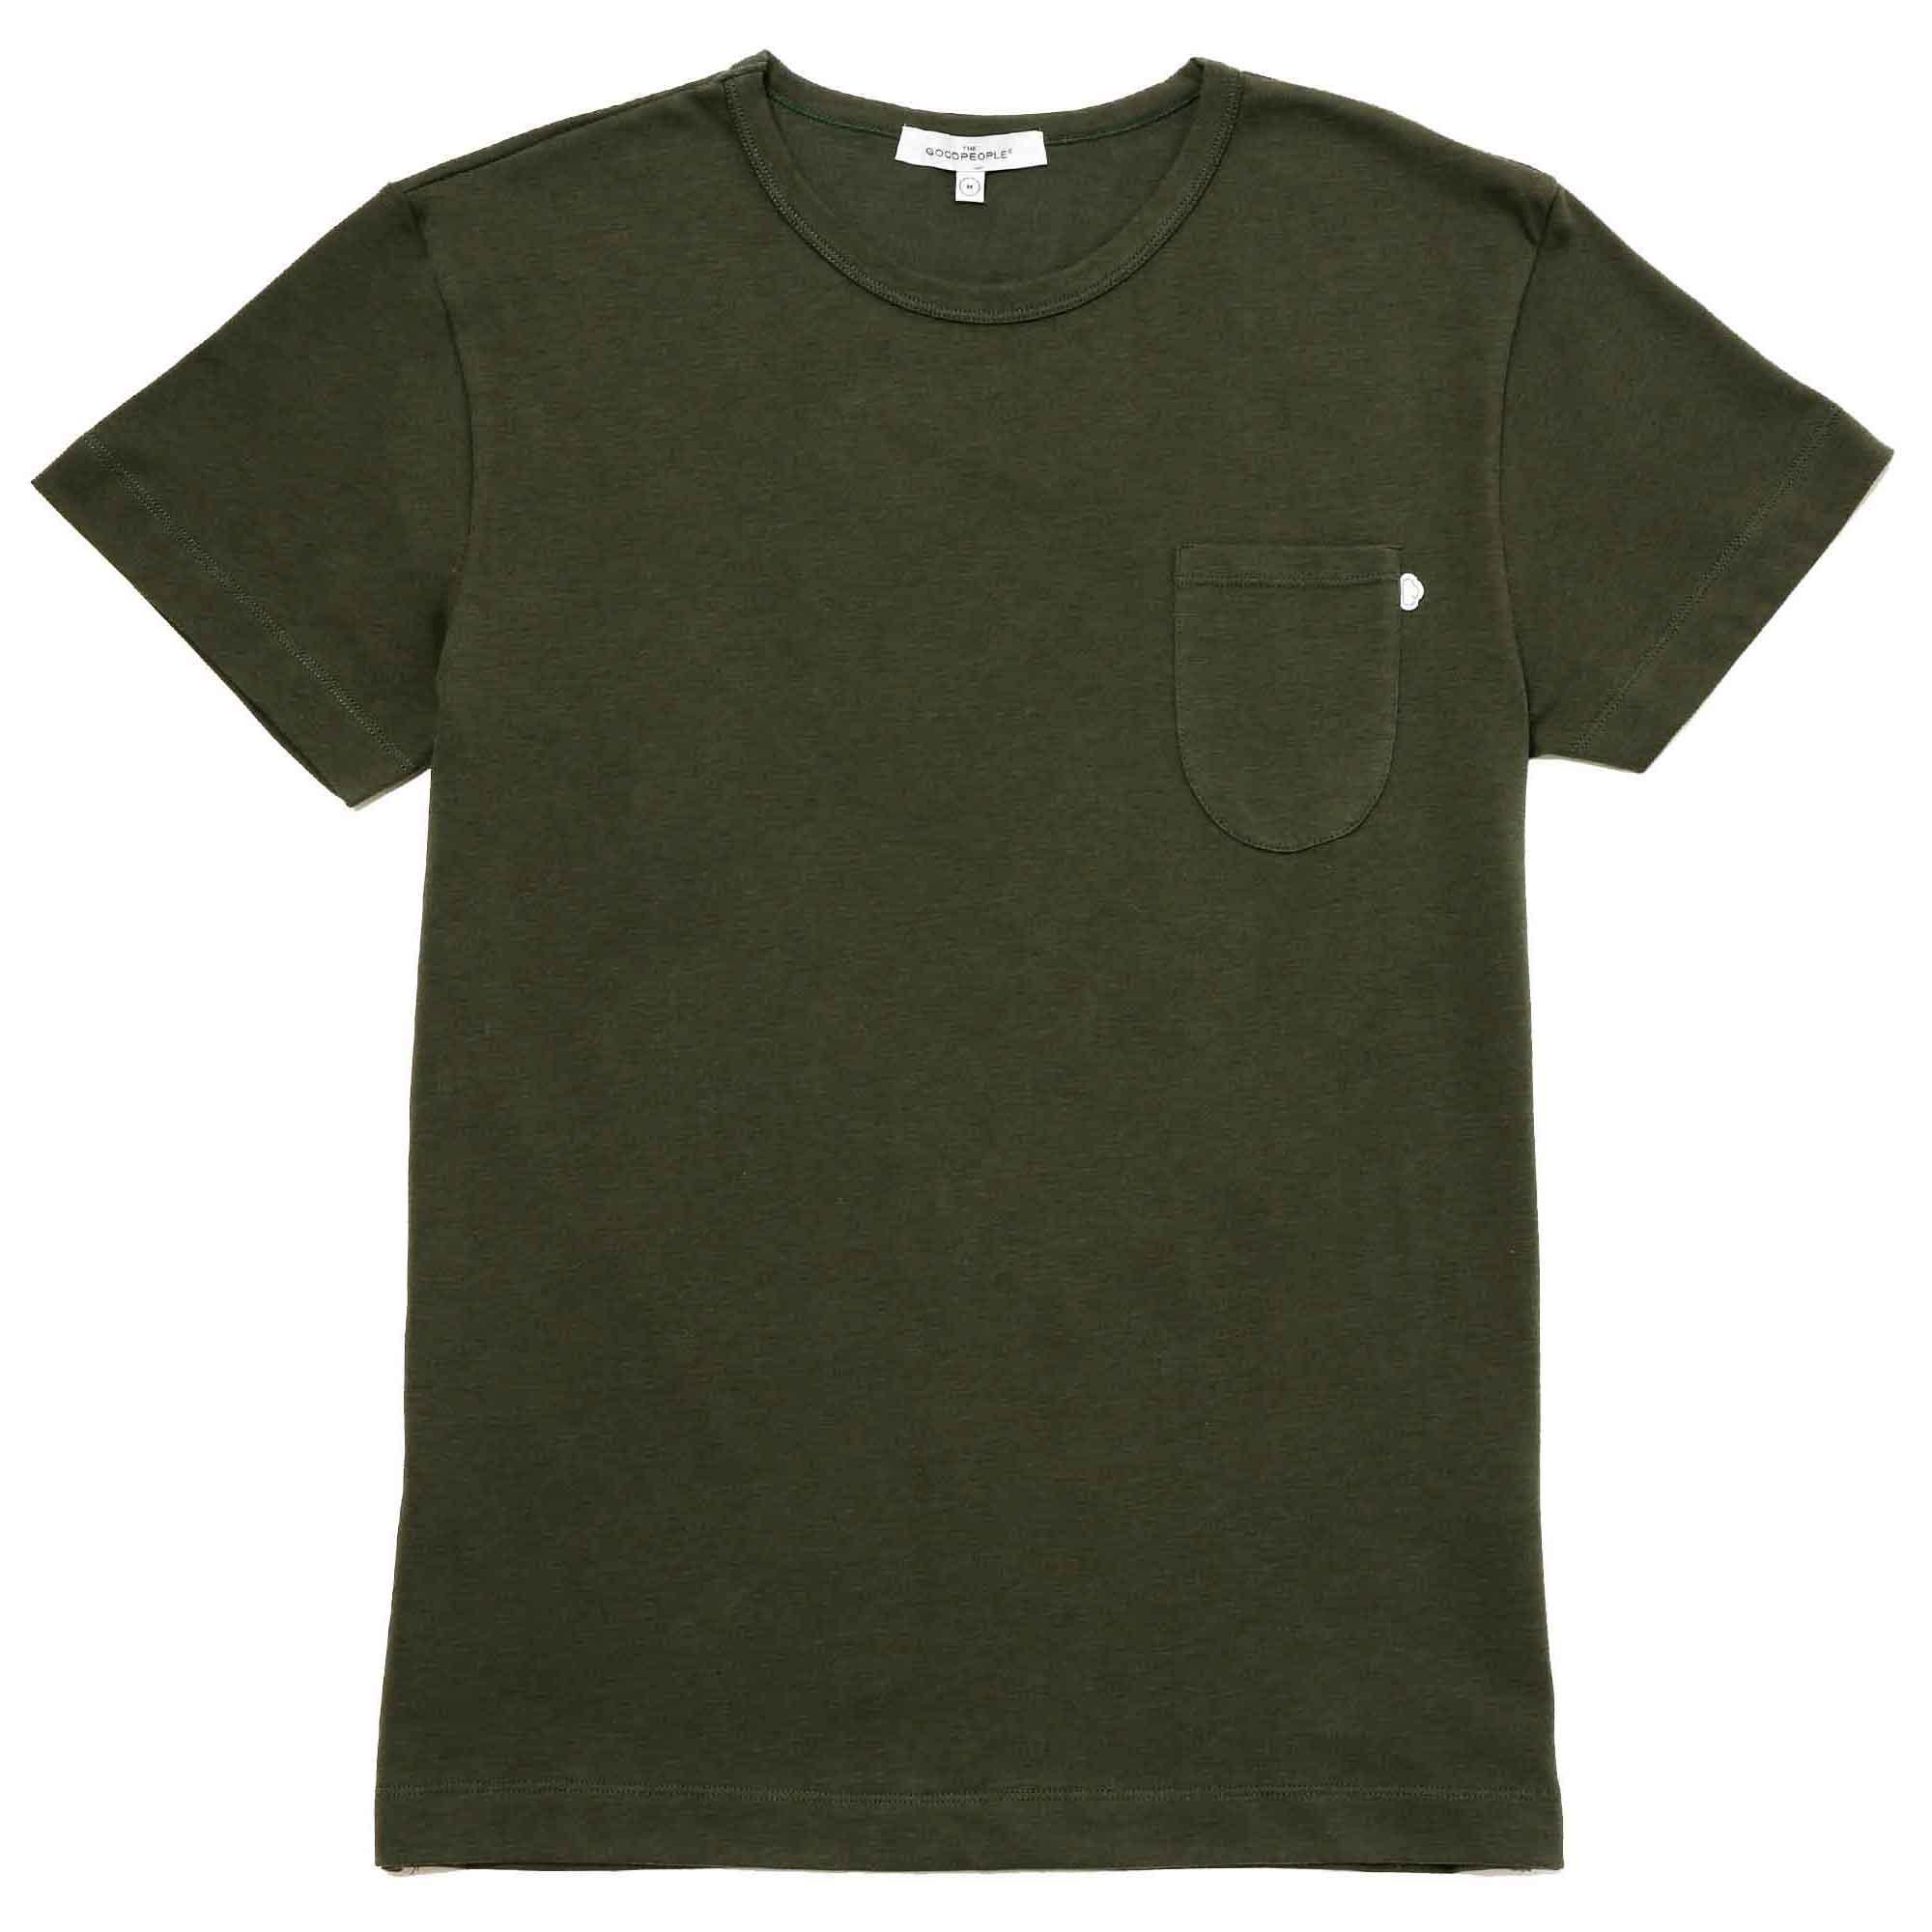 T-shirt verde con bolsa